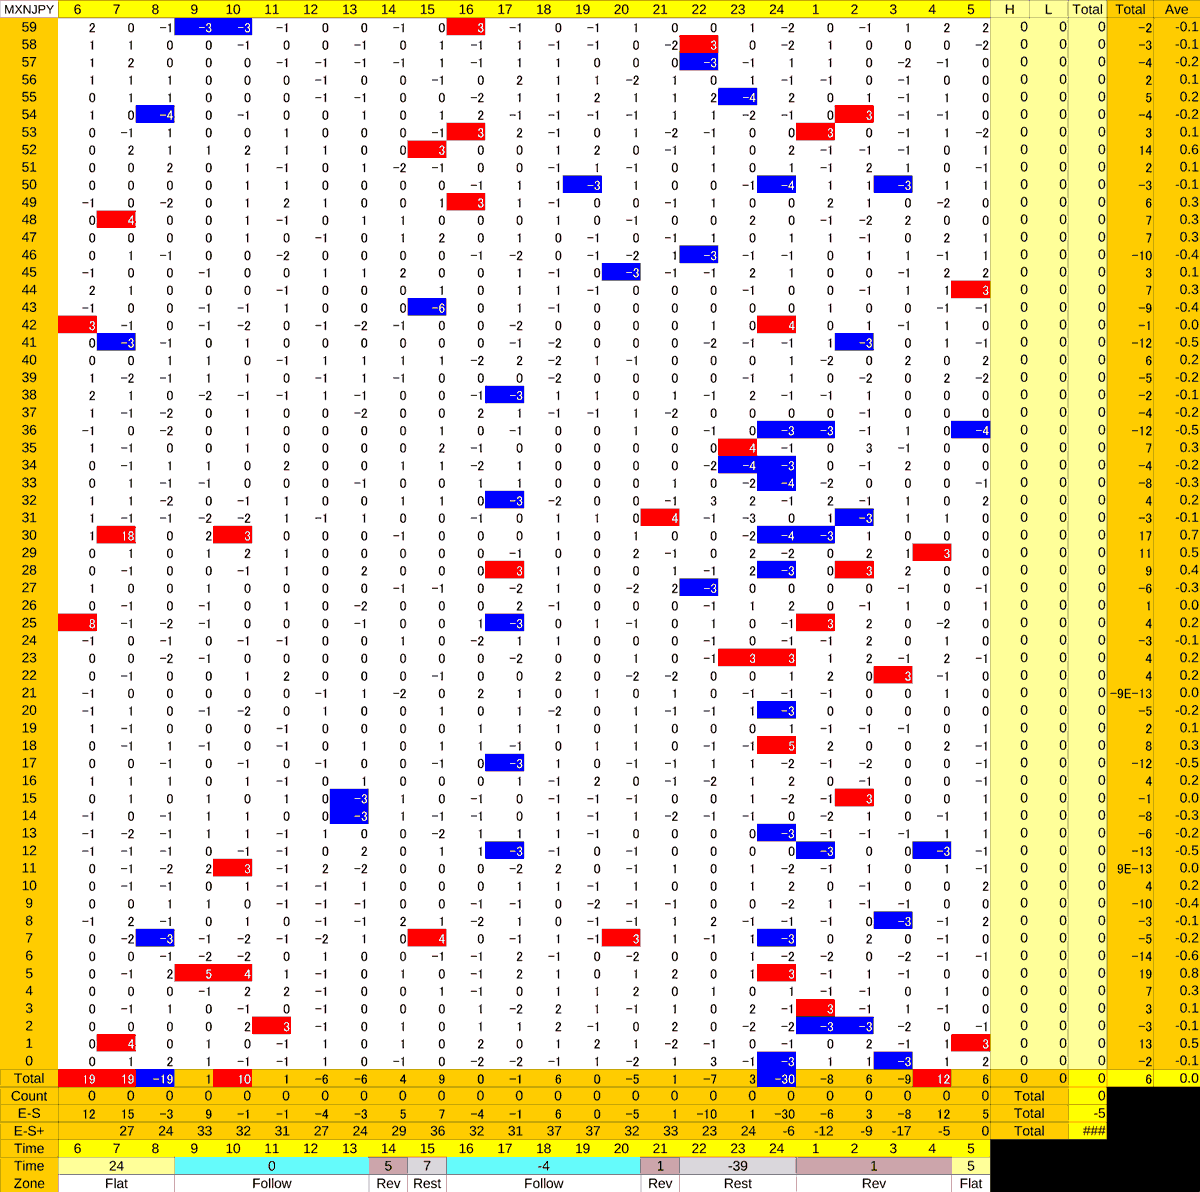 20201102_HS(3)MXNJPY